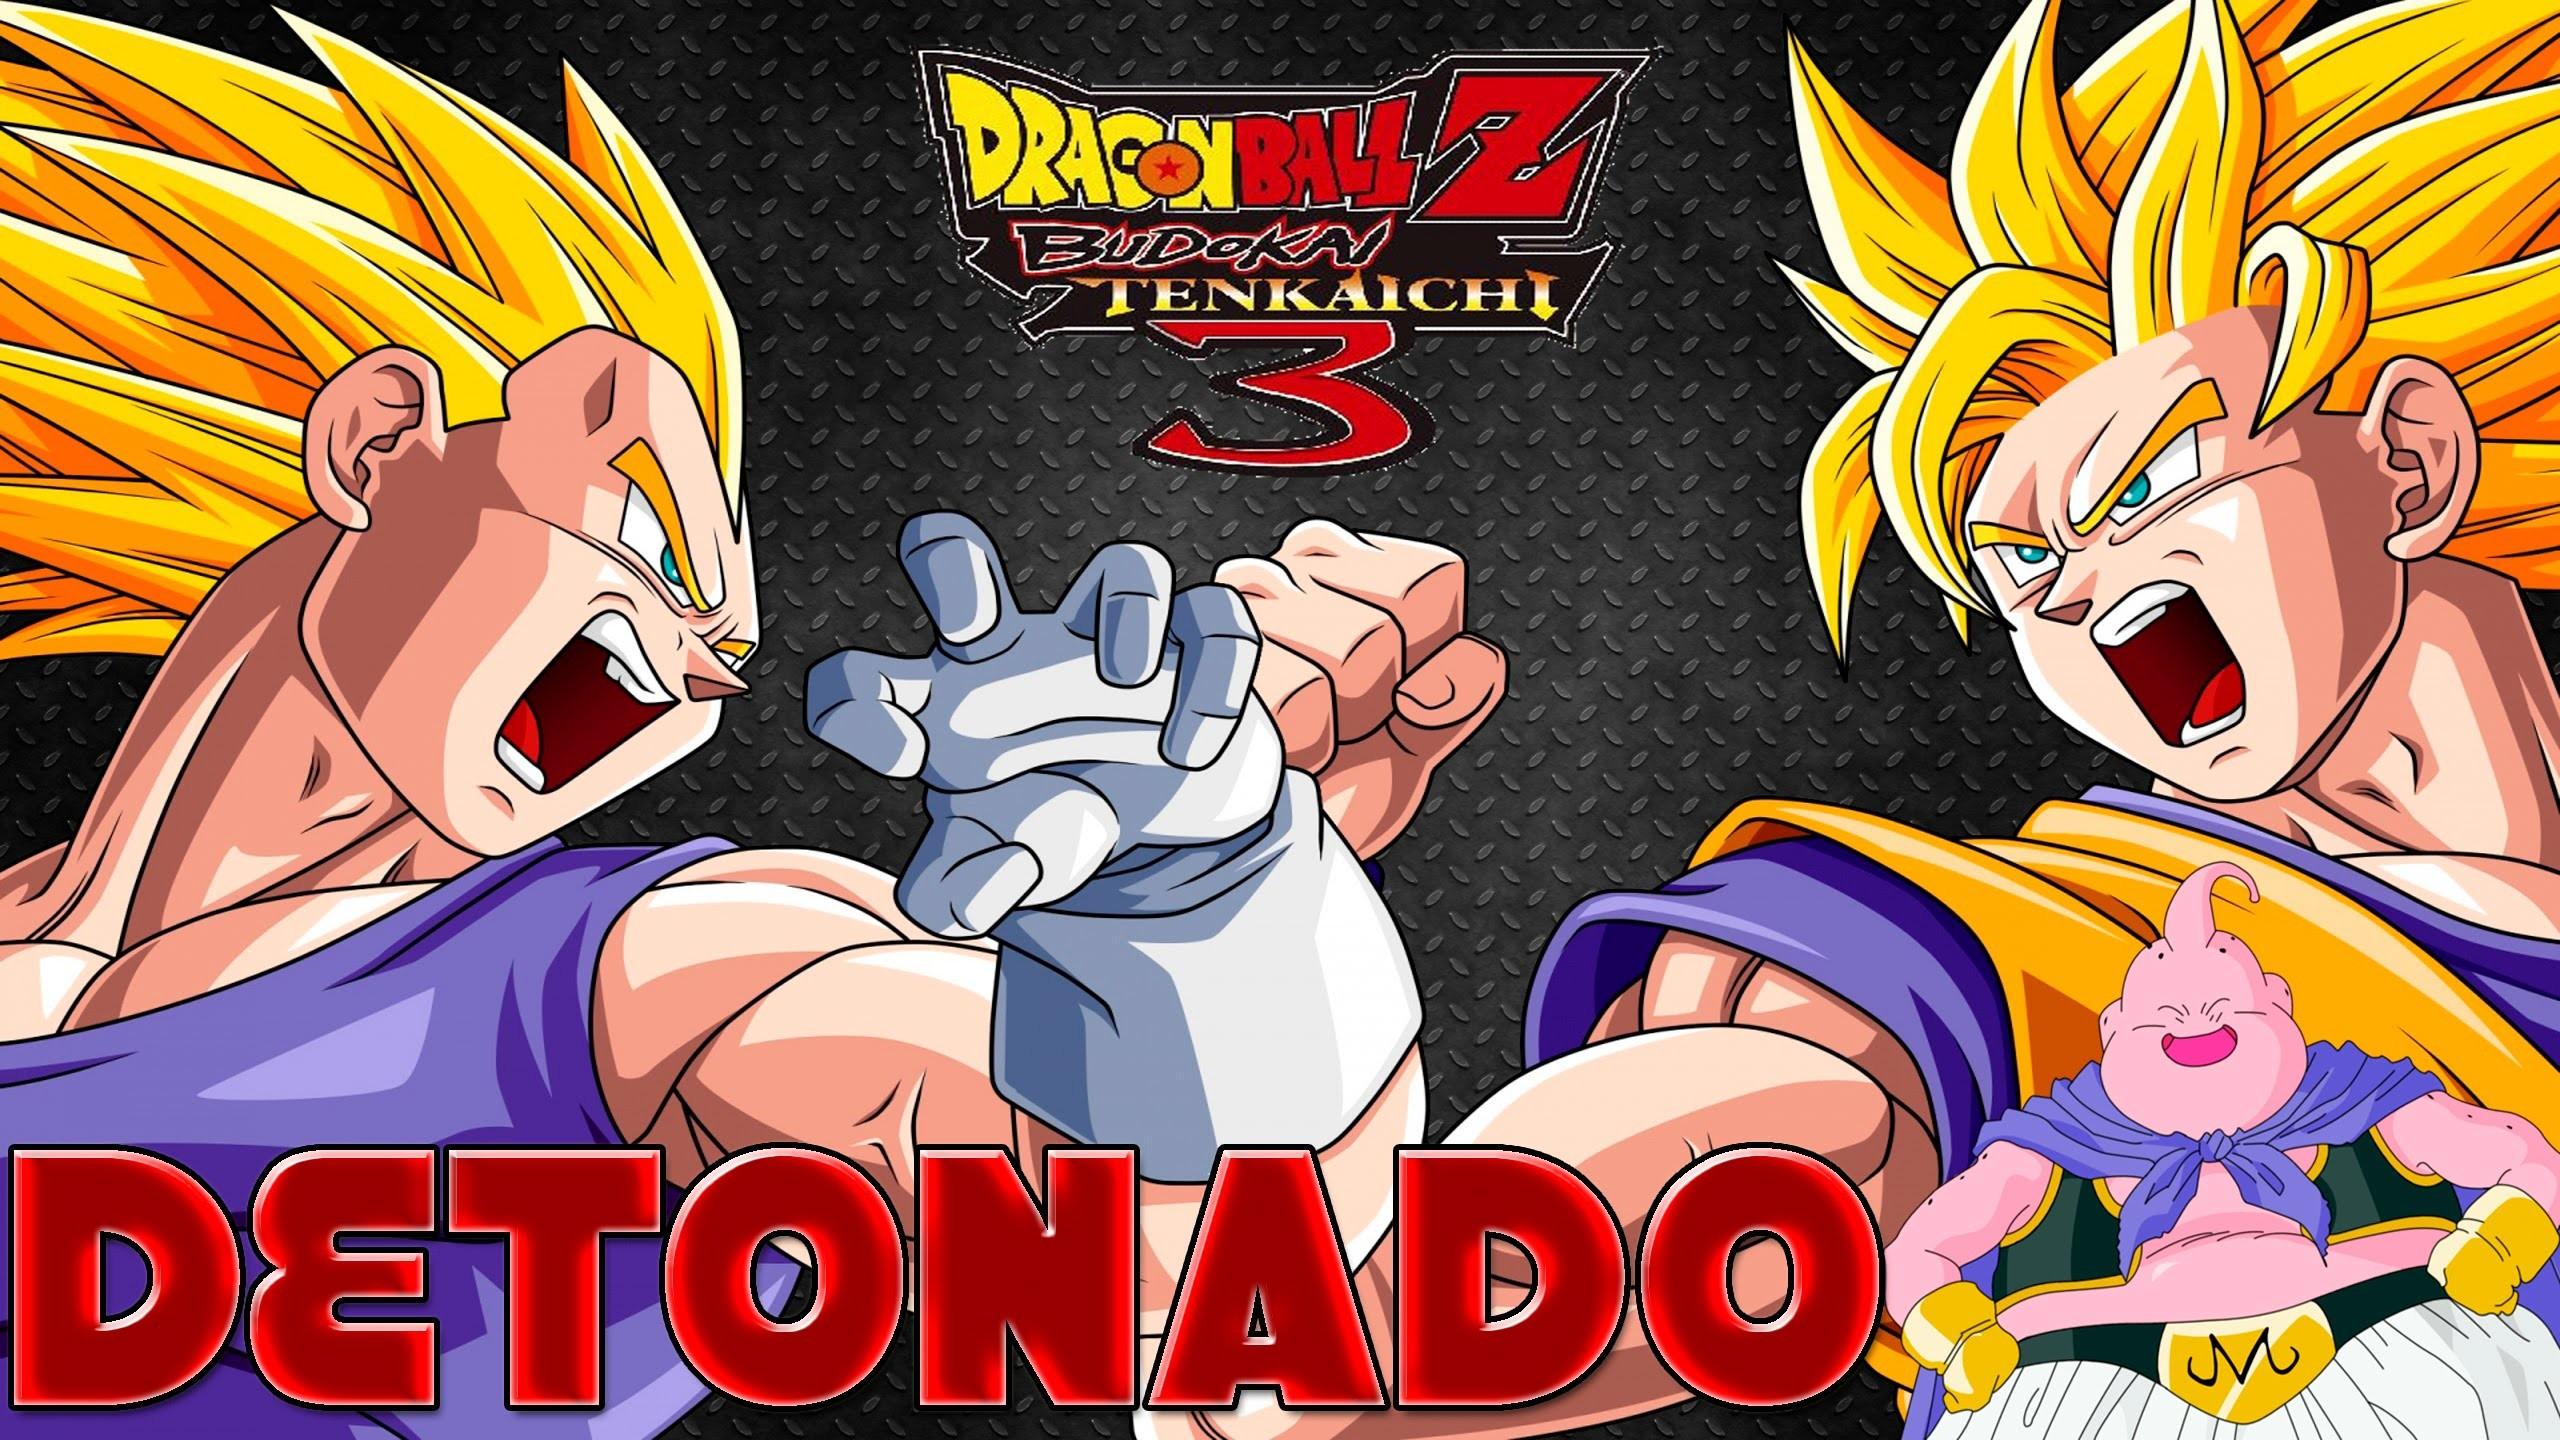 Goku vs Vegeta Wallpaper (65+ images)